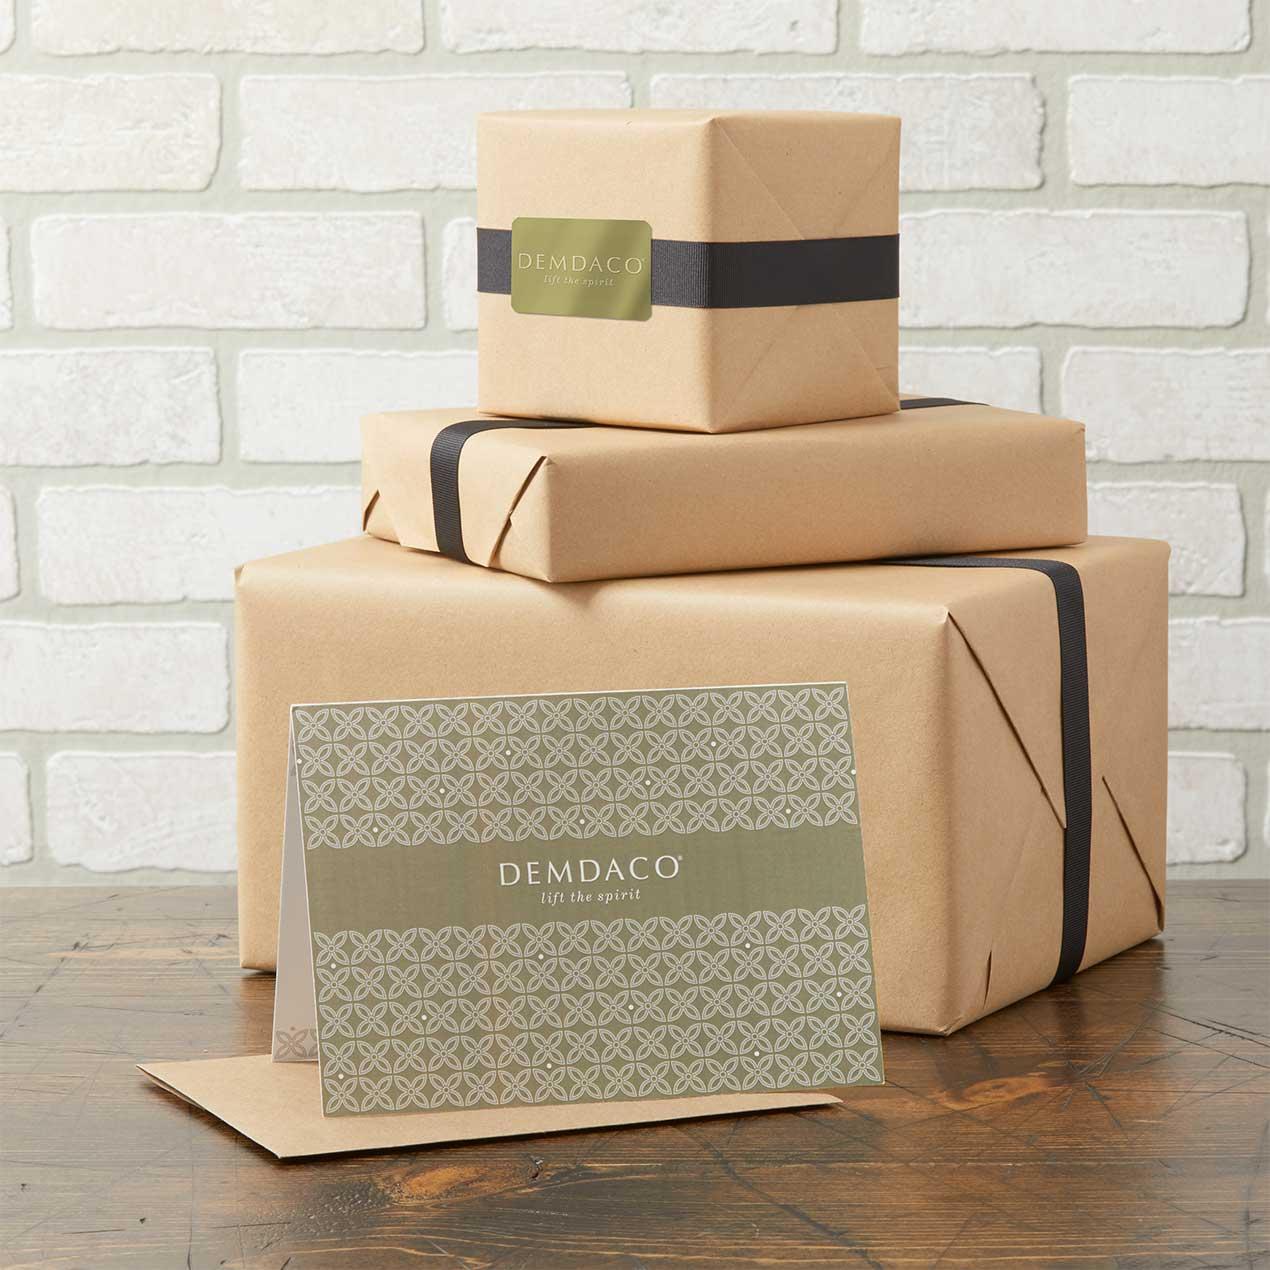 demdaco-gift-boxes.jpg